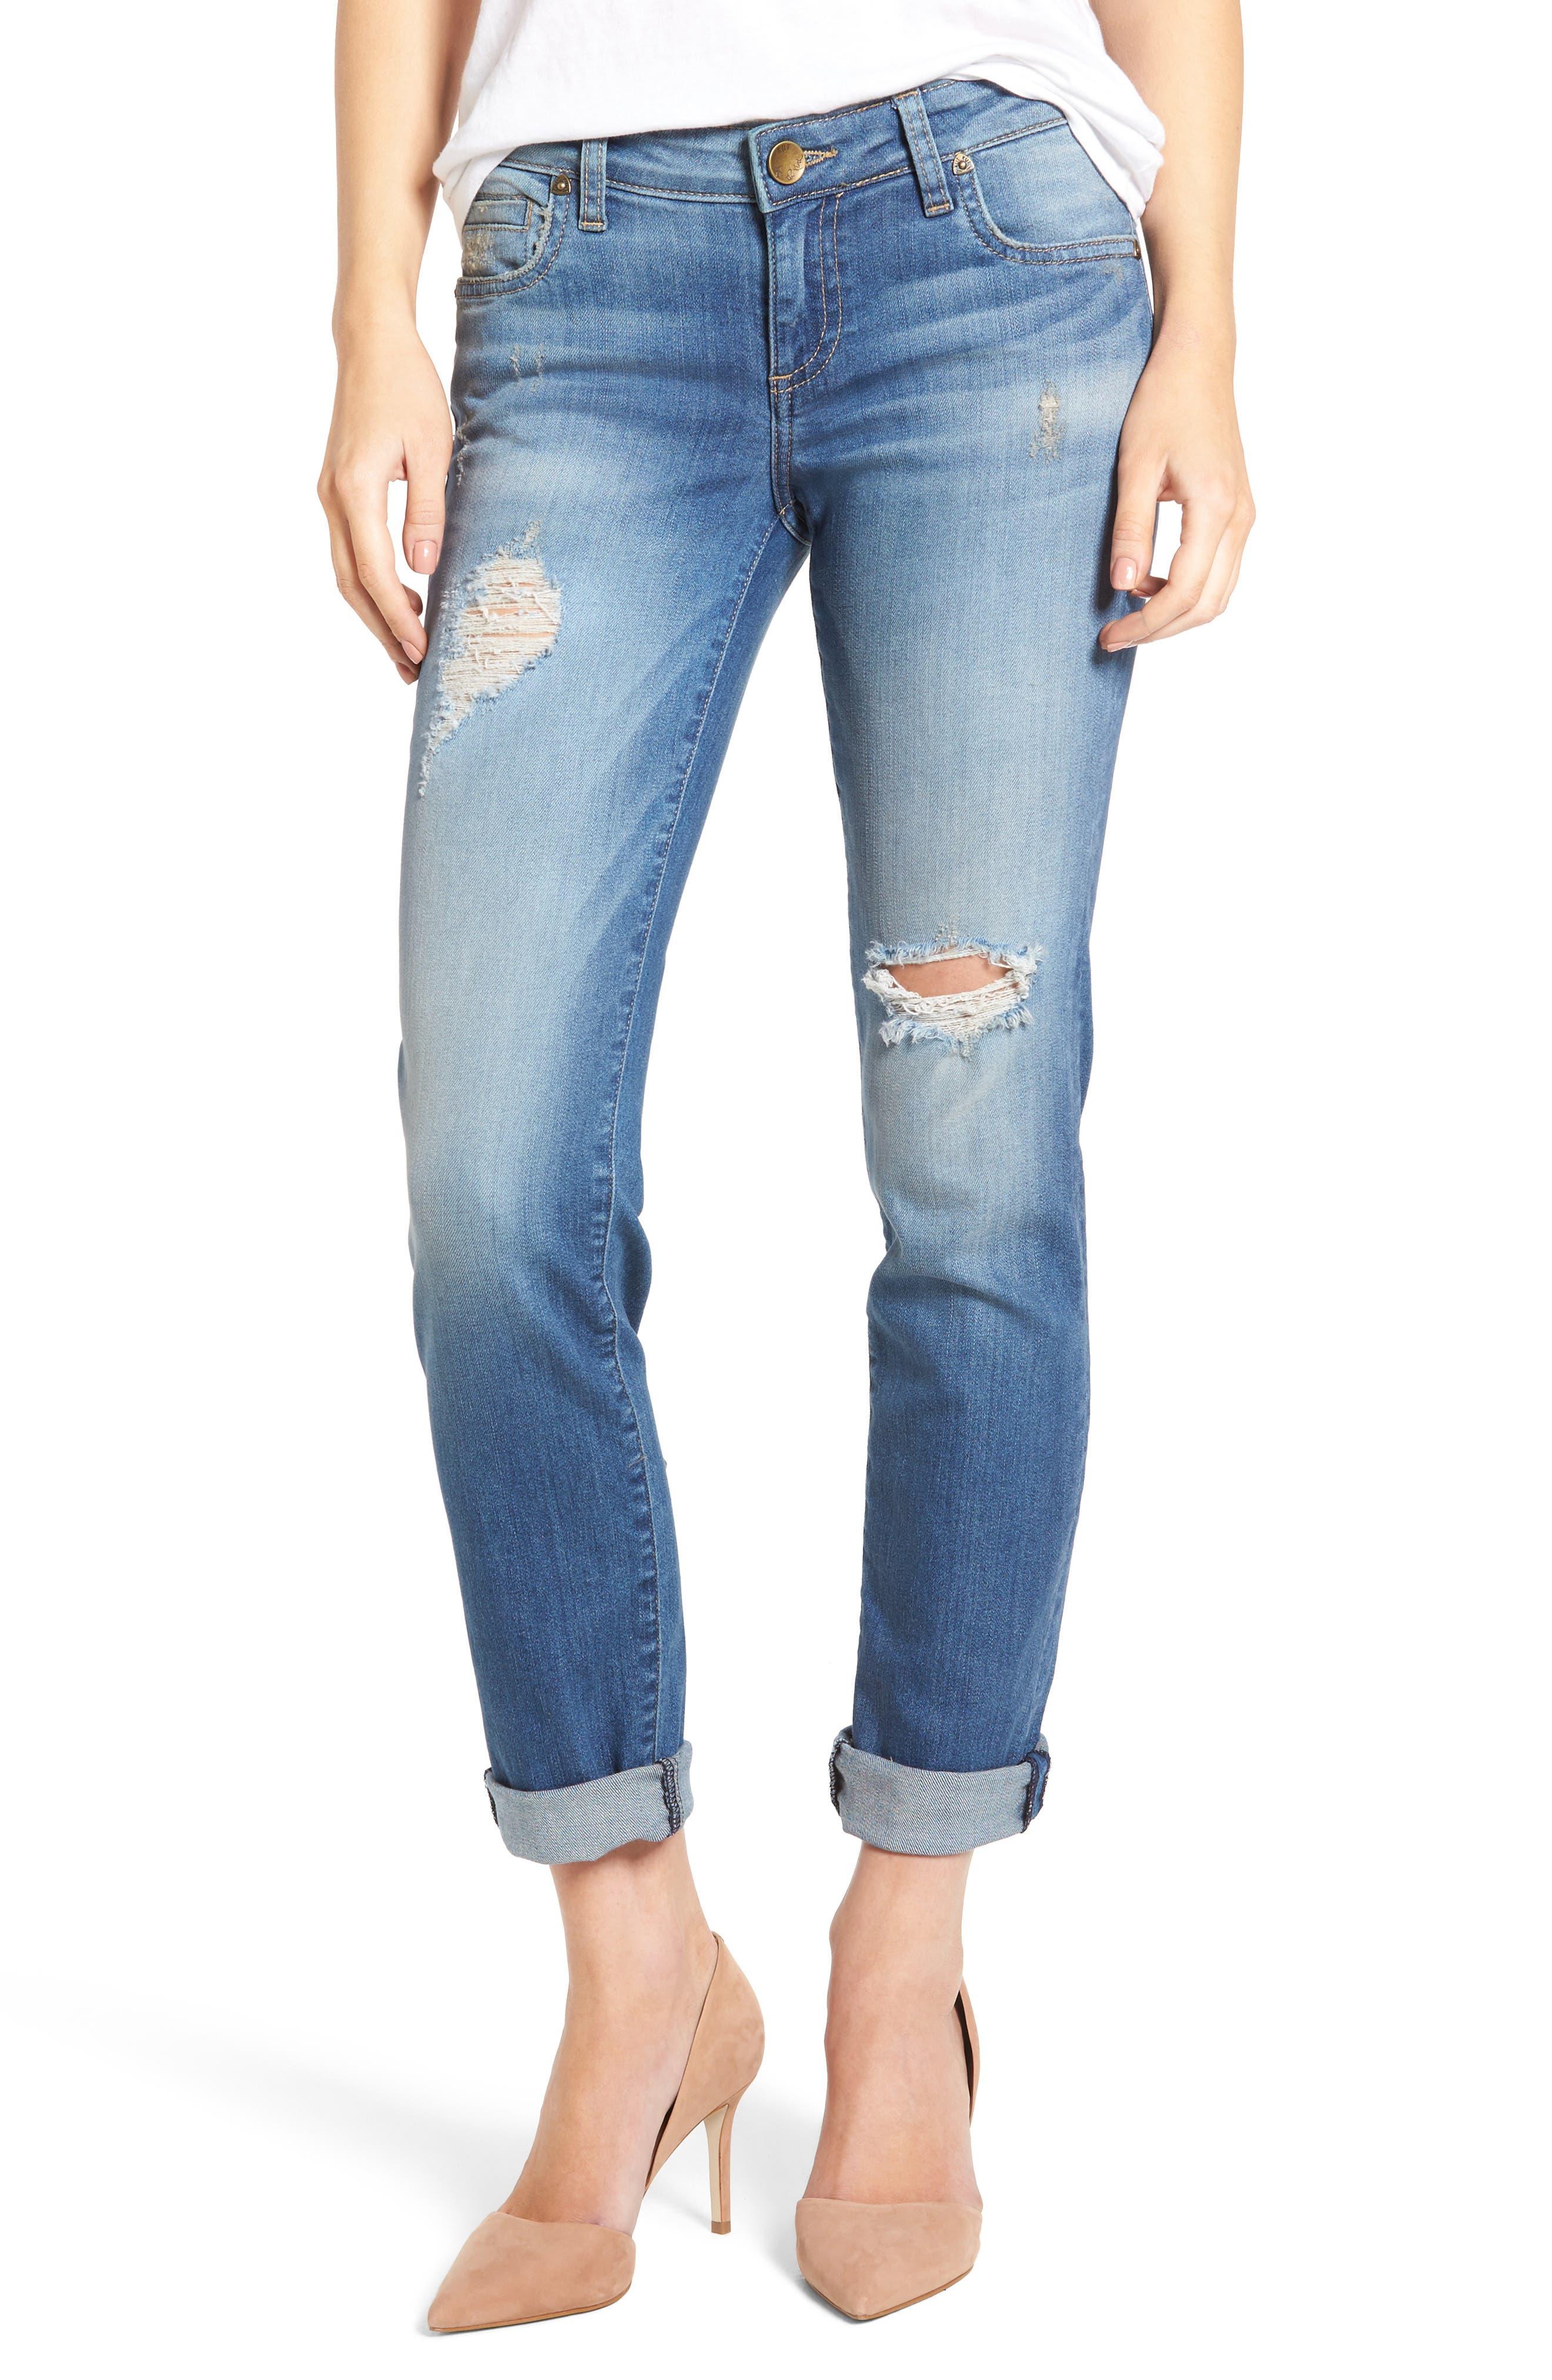 Alternate Image 1 Selected - KUT from the Kloth Catherine Distressed Boyfriend Jeans (Fiery) (Regular & Petite)